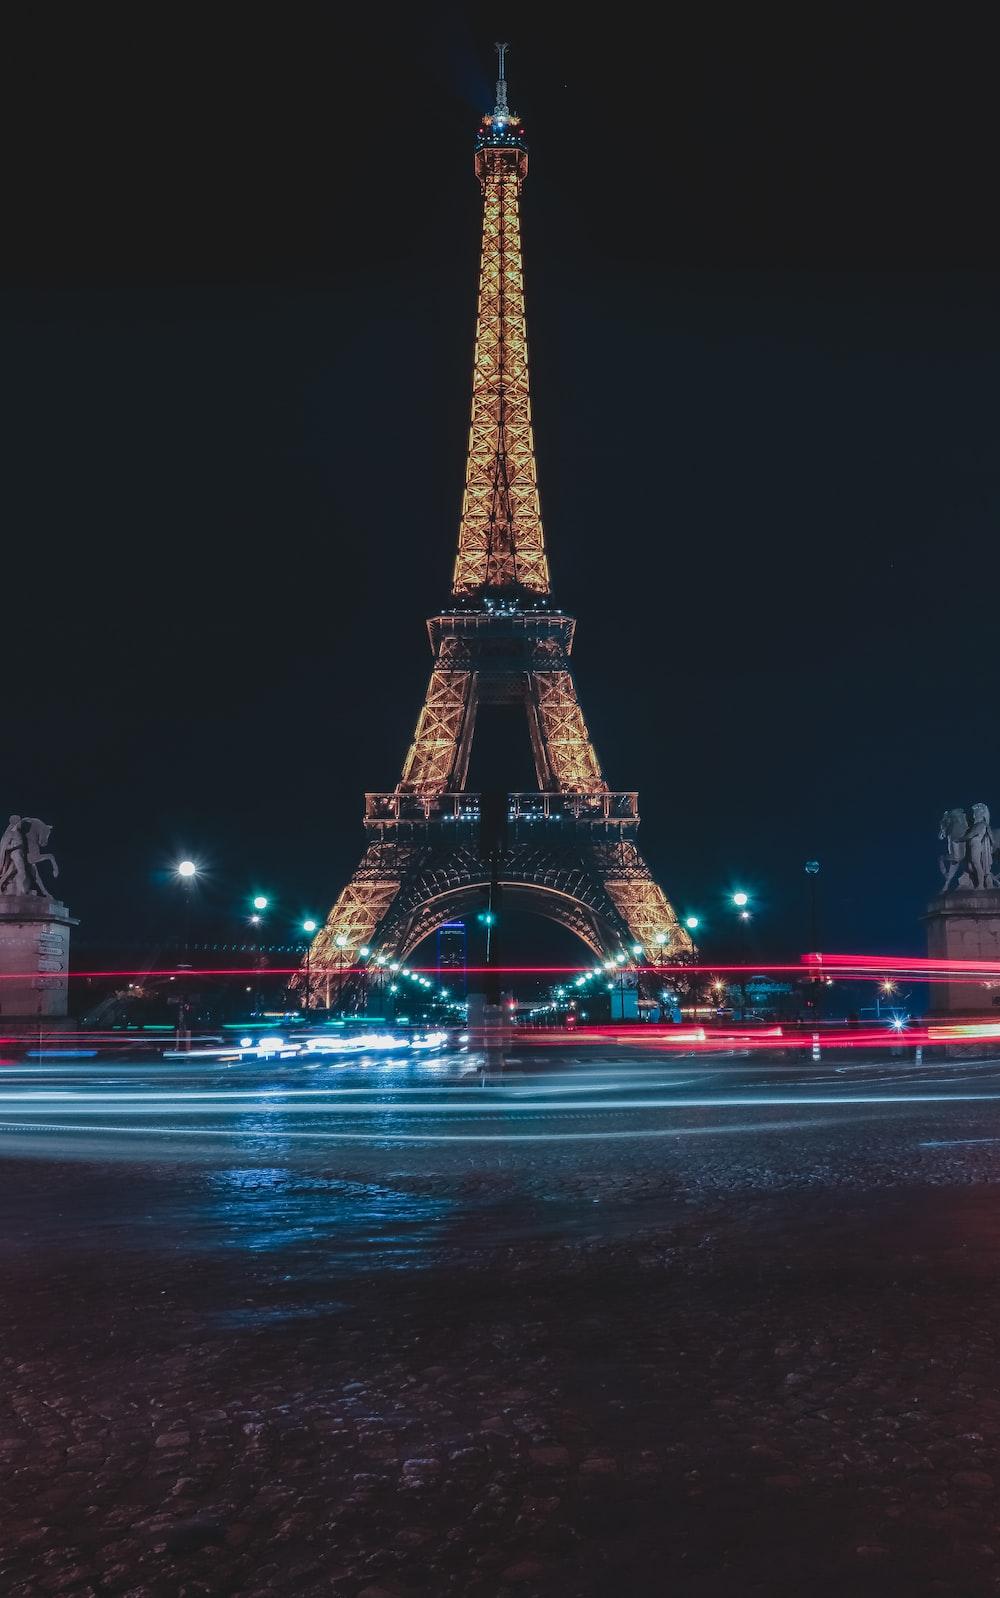 Eiffel Tower, Paris during nighttime